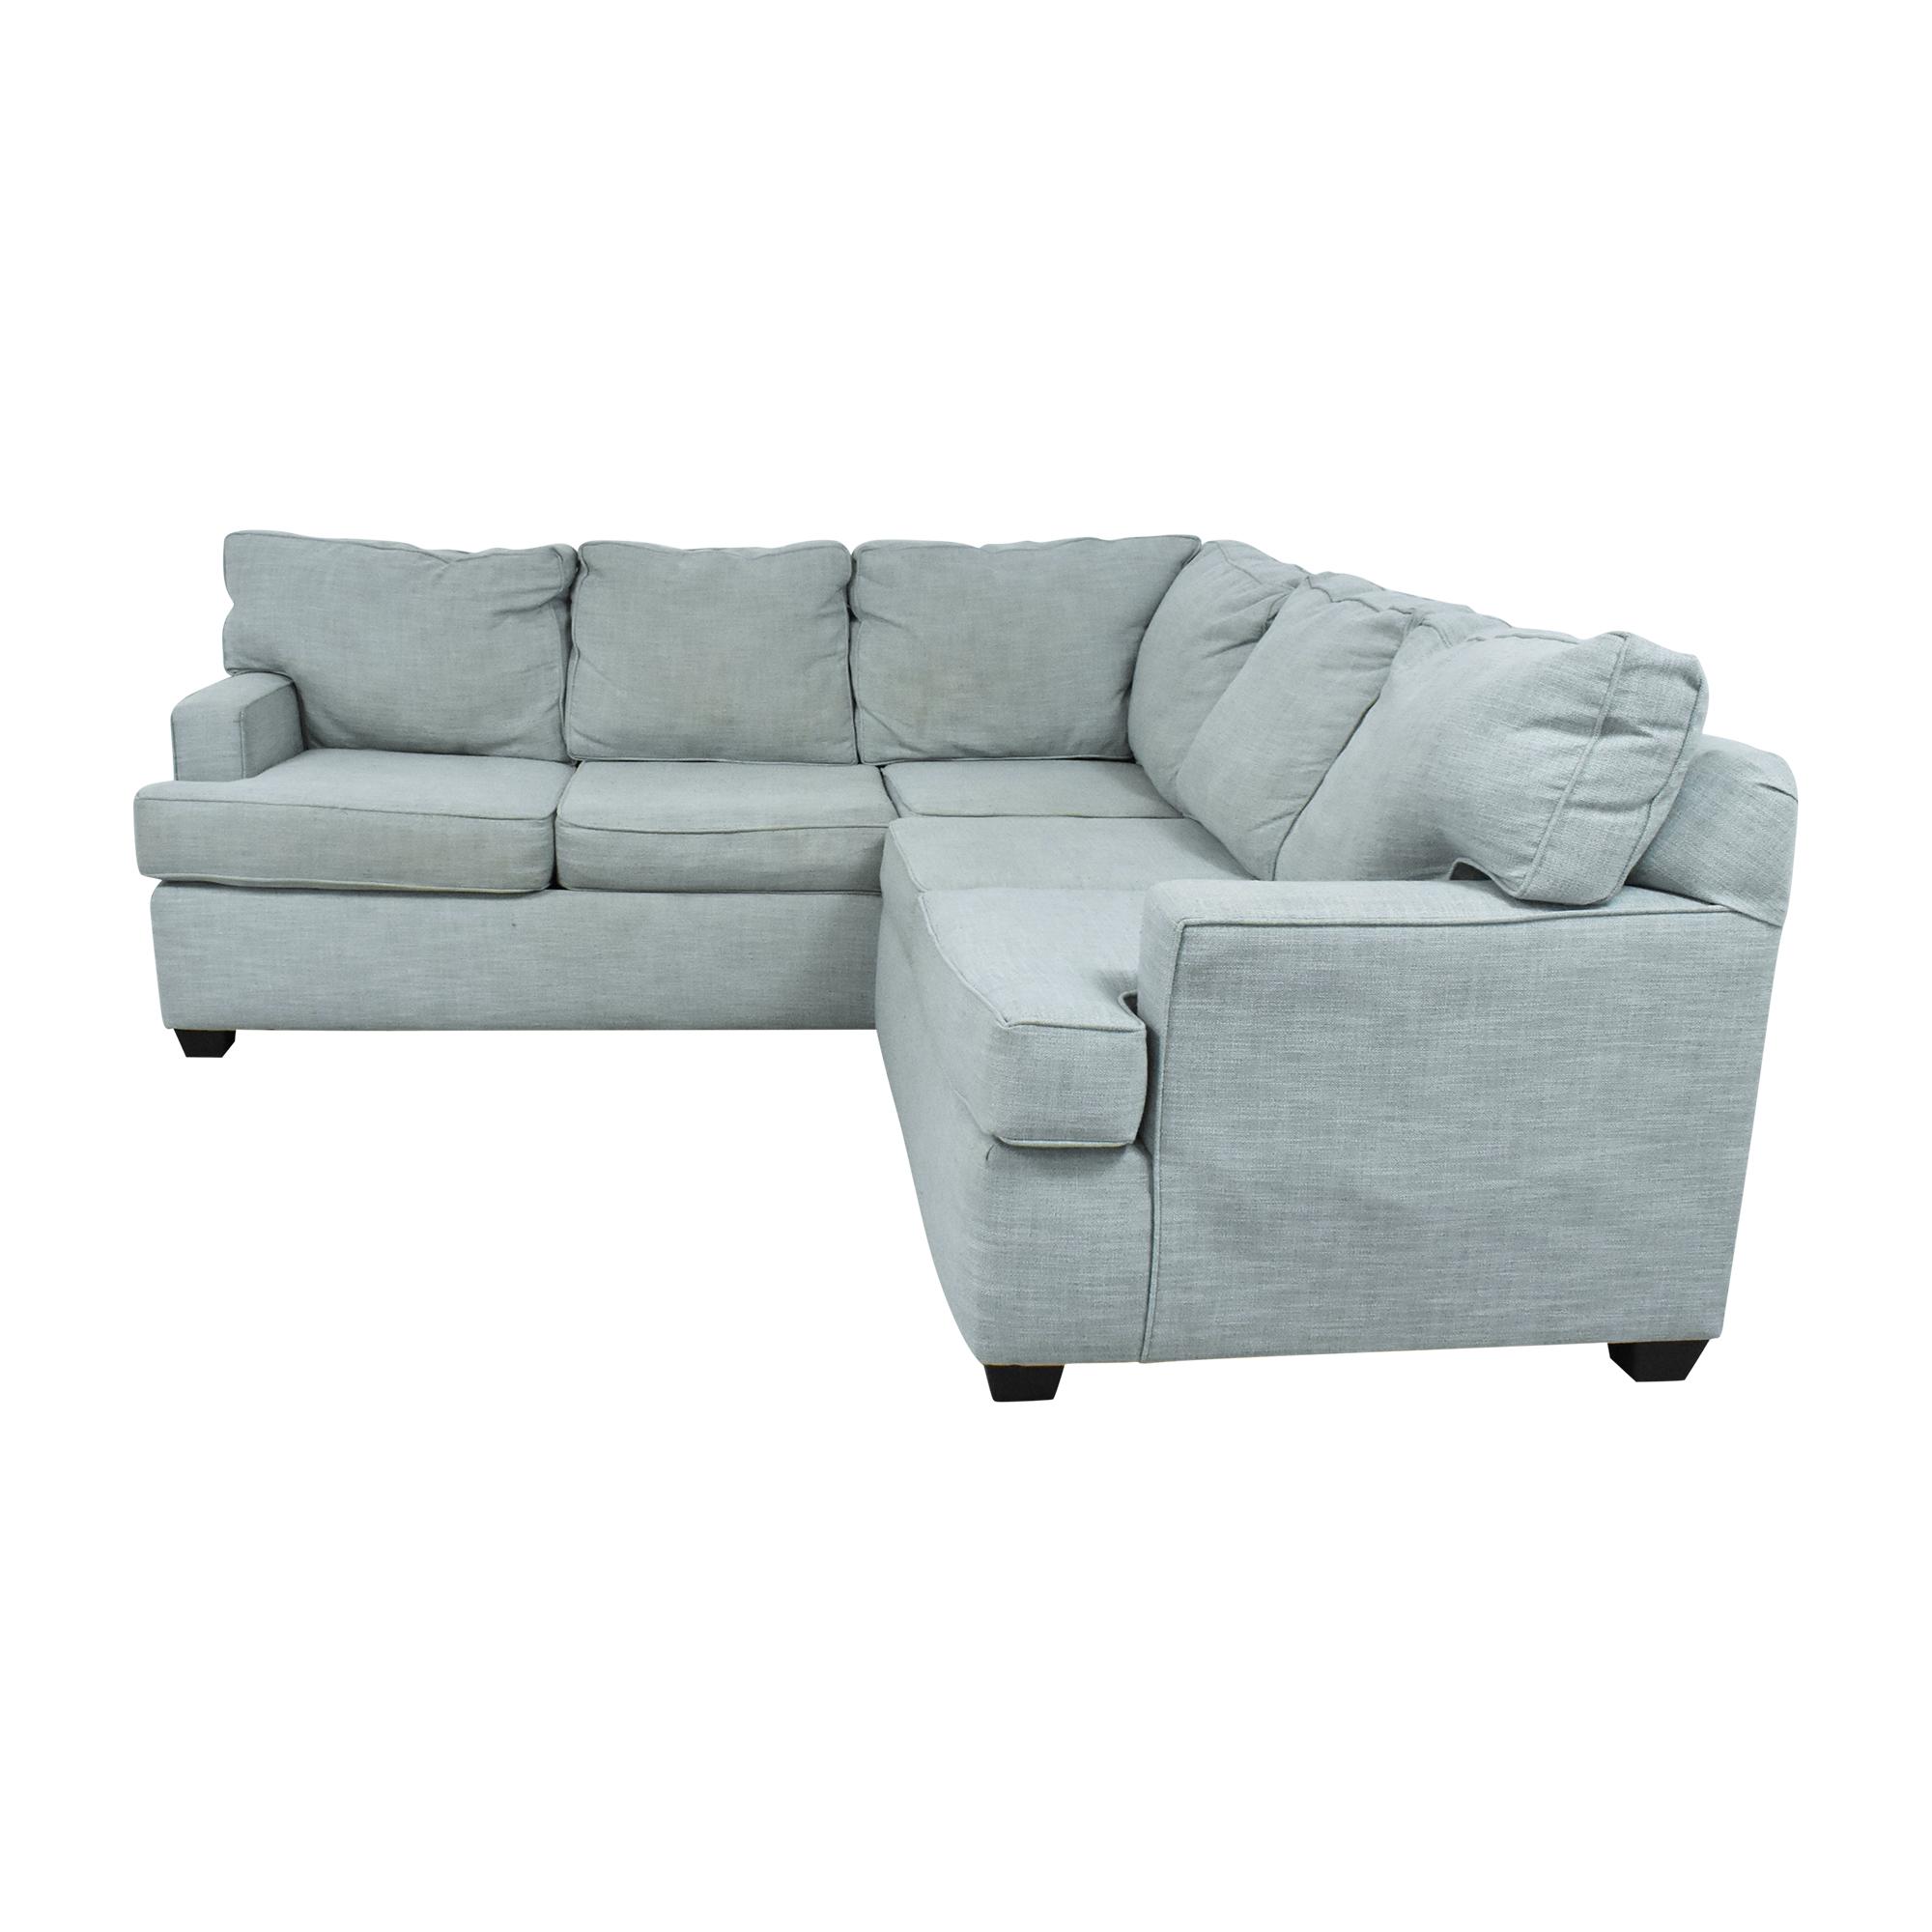 KFI Corner Sectional Sofa / Sectionals